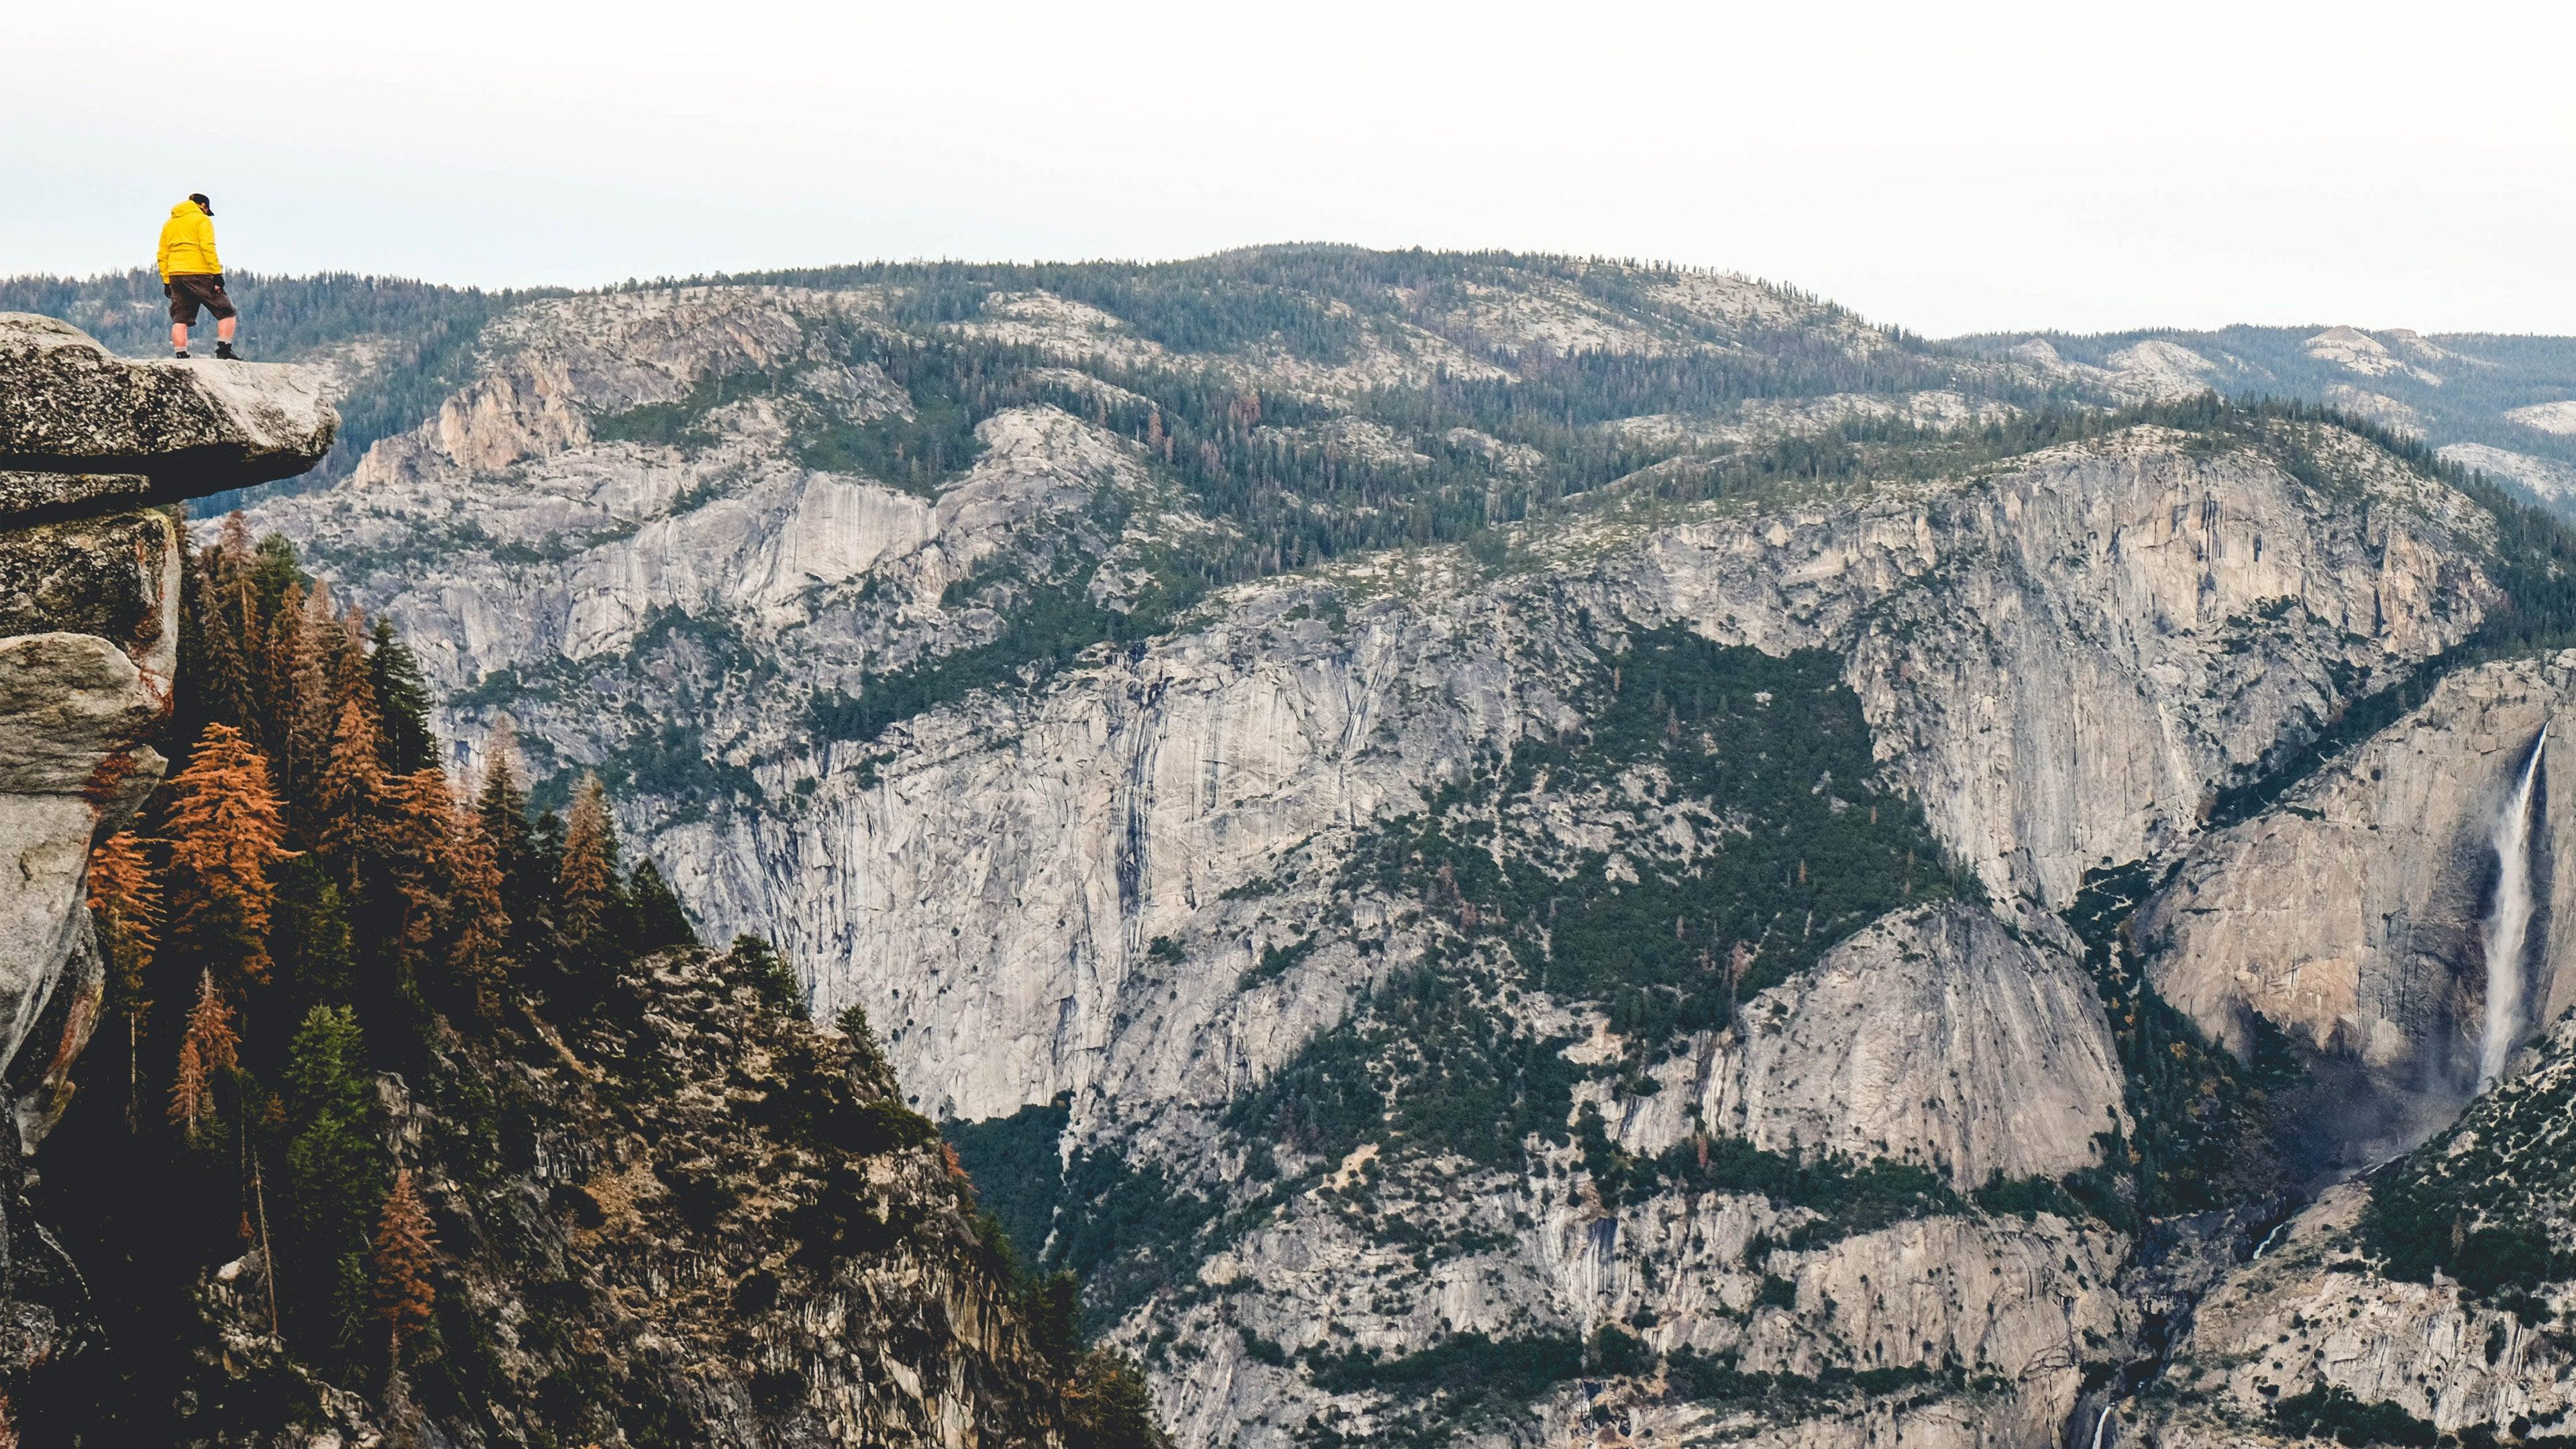 Yosemite 4k Wallpapers For Your Desktop Or Mobile Screen